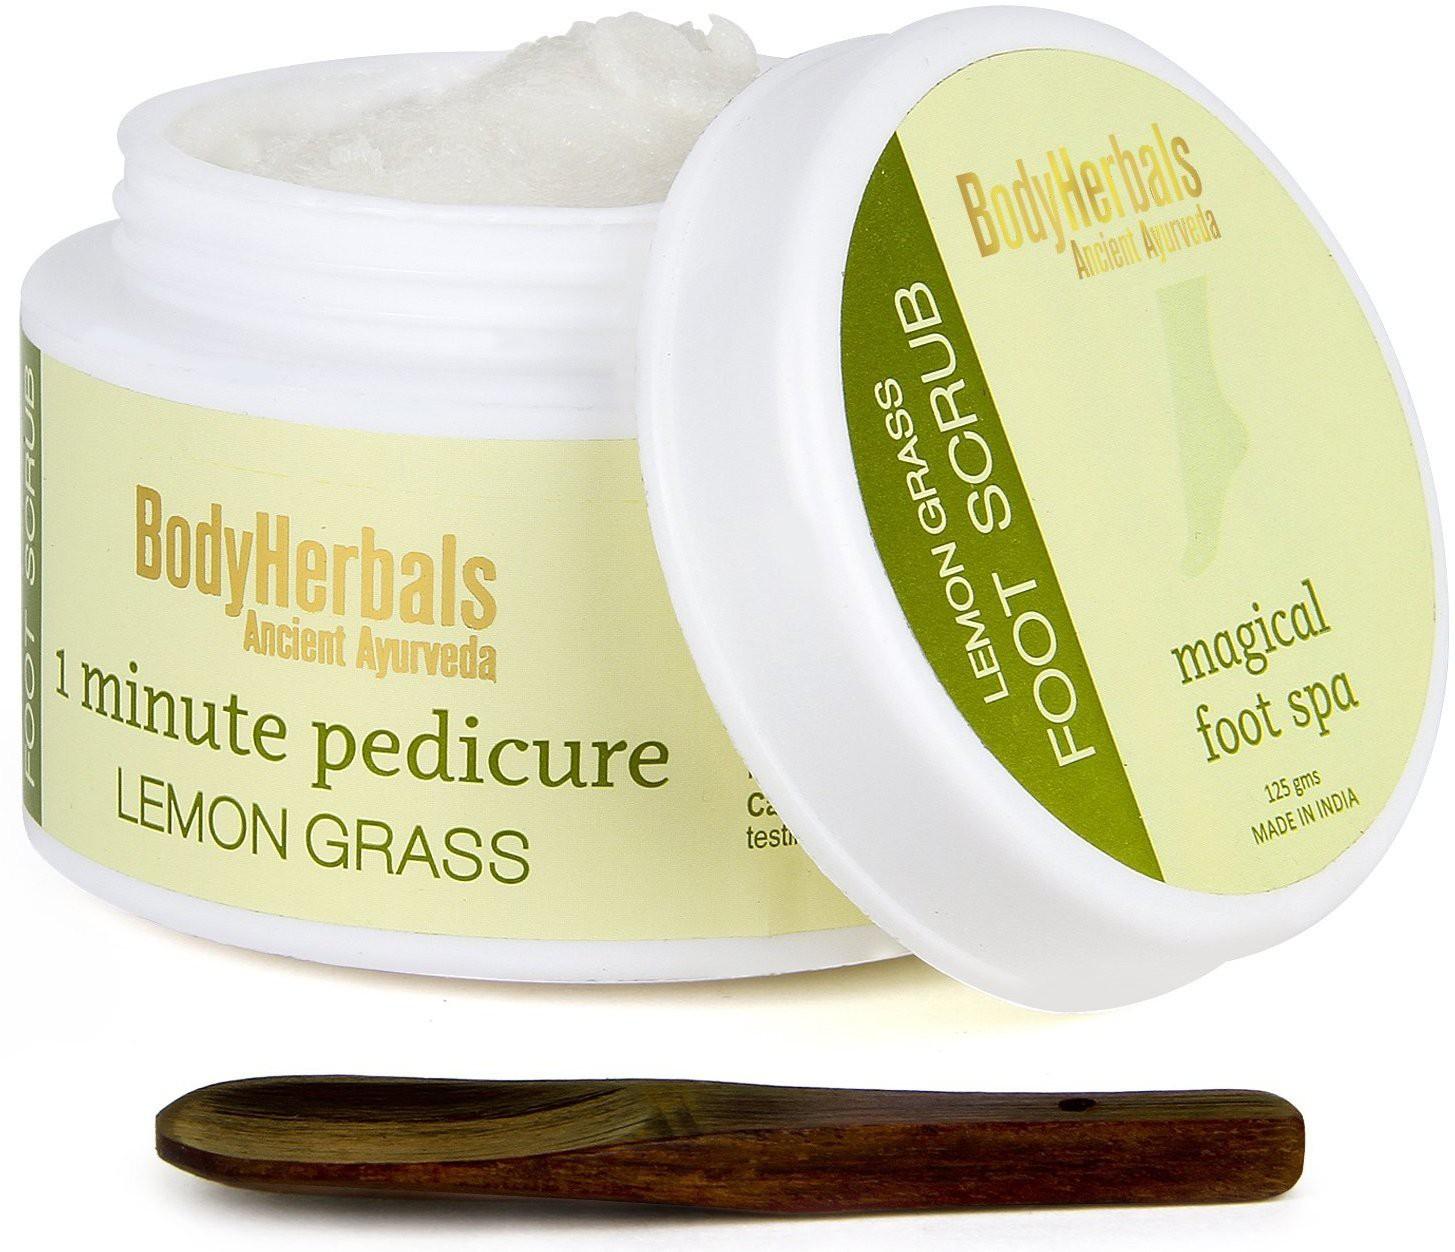 BodyHerbals Lemongrass Foot Scrub, 1 Minute Pedicure Scrub(125 g)